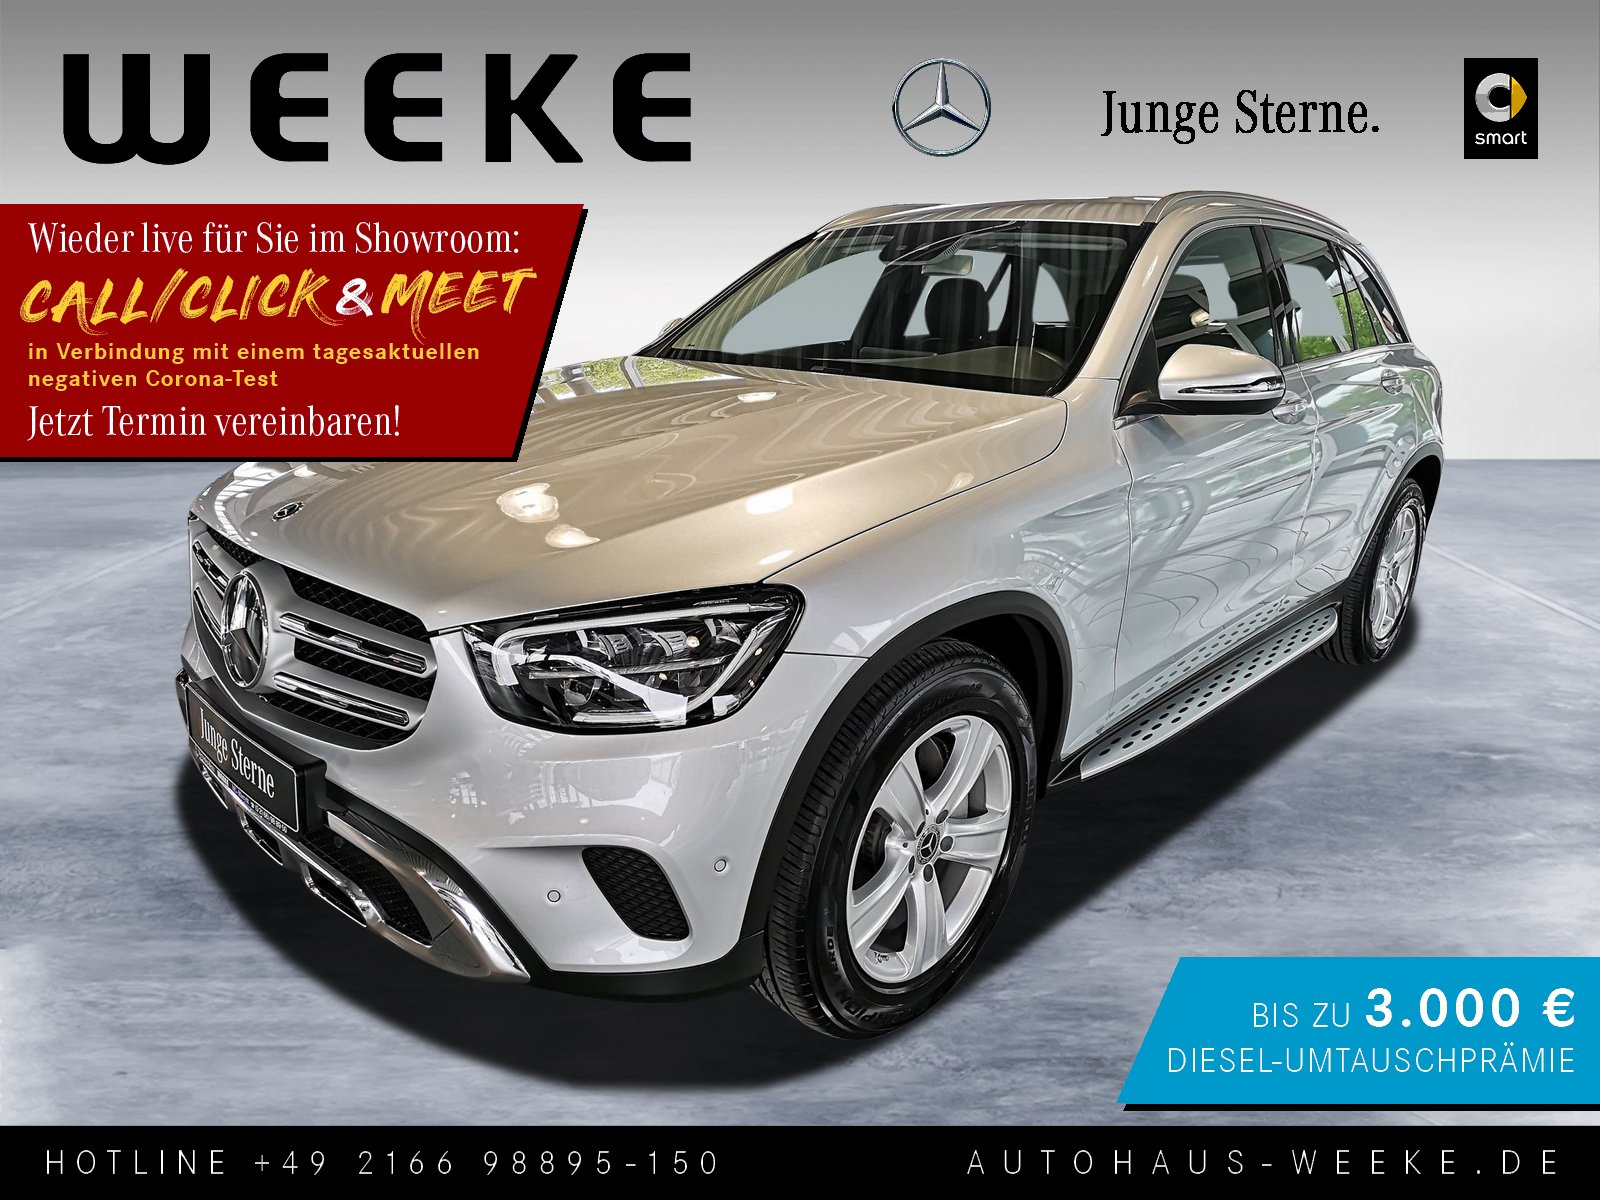 Mercedes-Benz GLC 200 4M Trittbretter+ASSITENZ-PAKET+LED+EASY-, Jahr 2019, Benzin